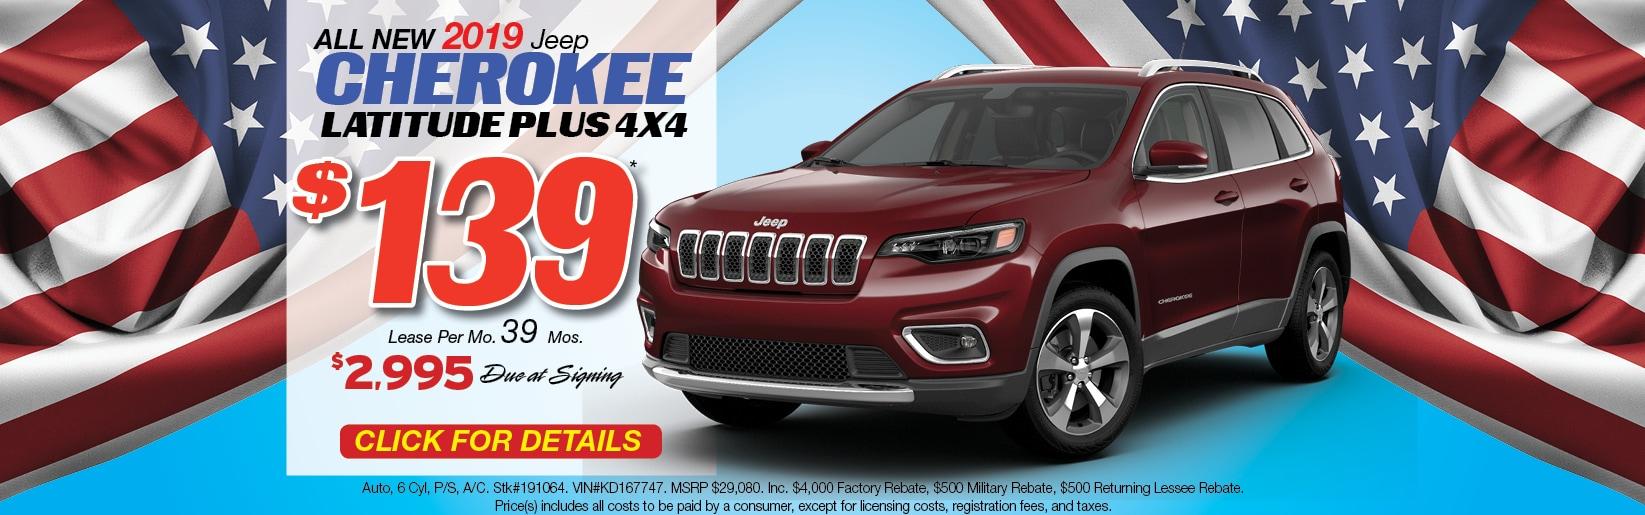 Teterboro Chrysler Jeep Dodge Ram Deals New Jersey. Welcome ...